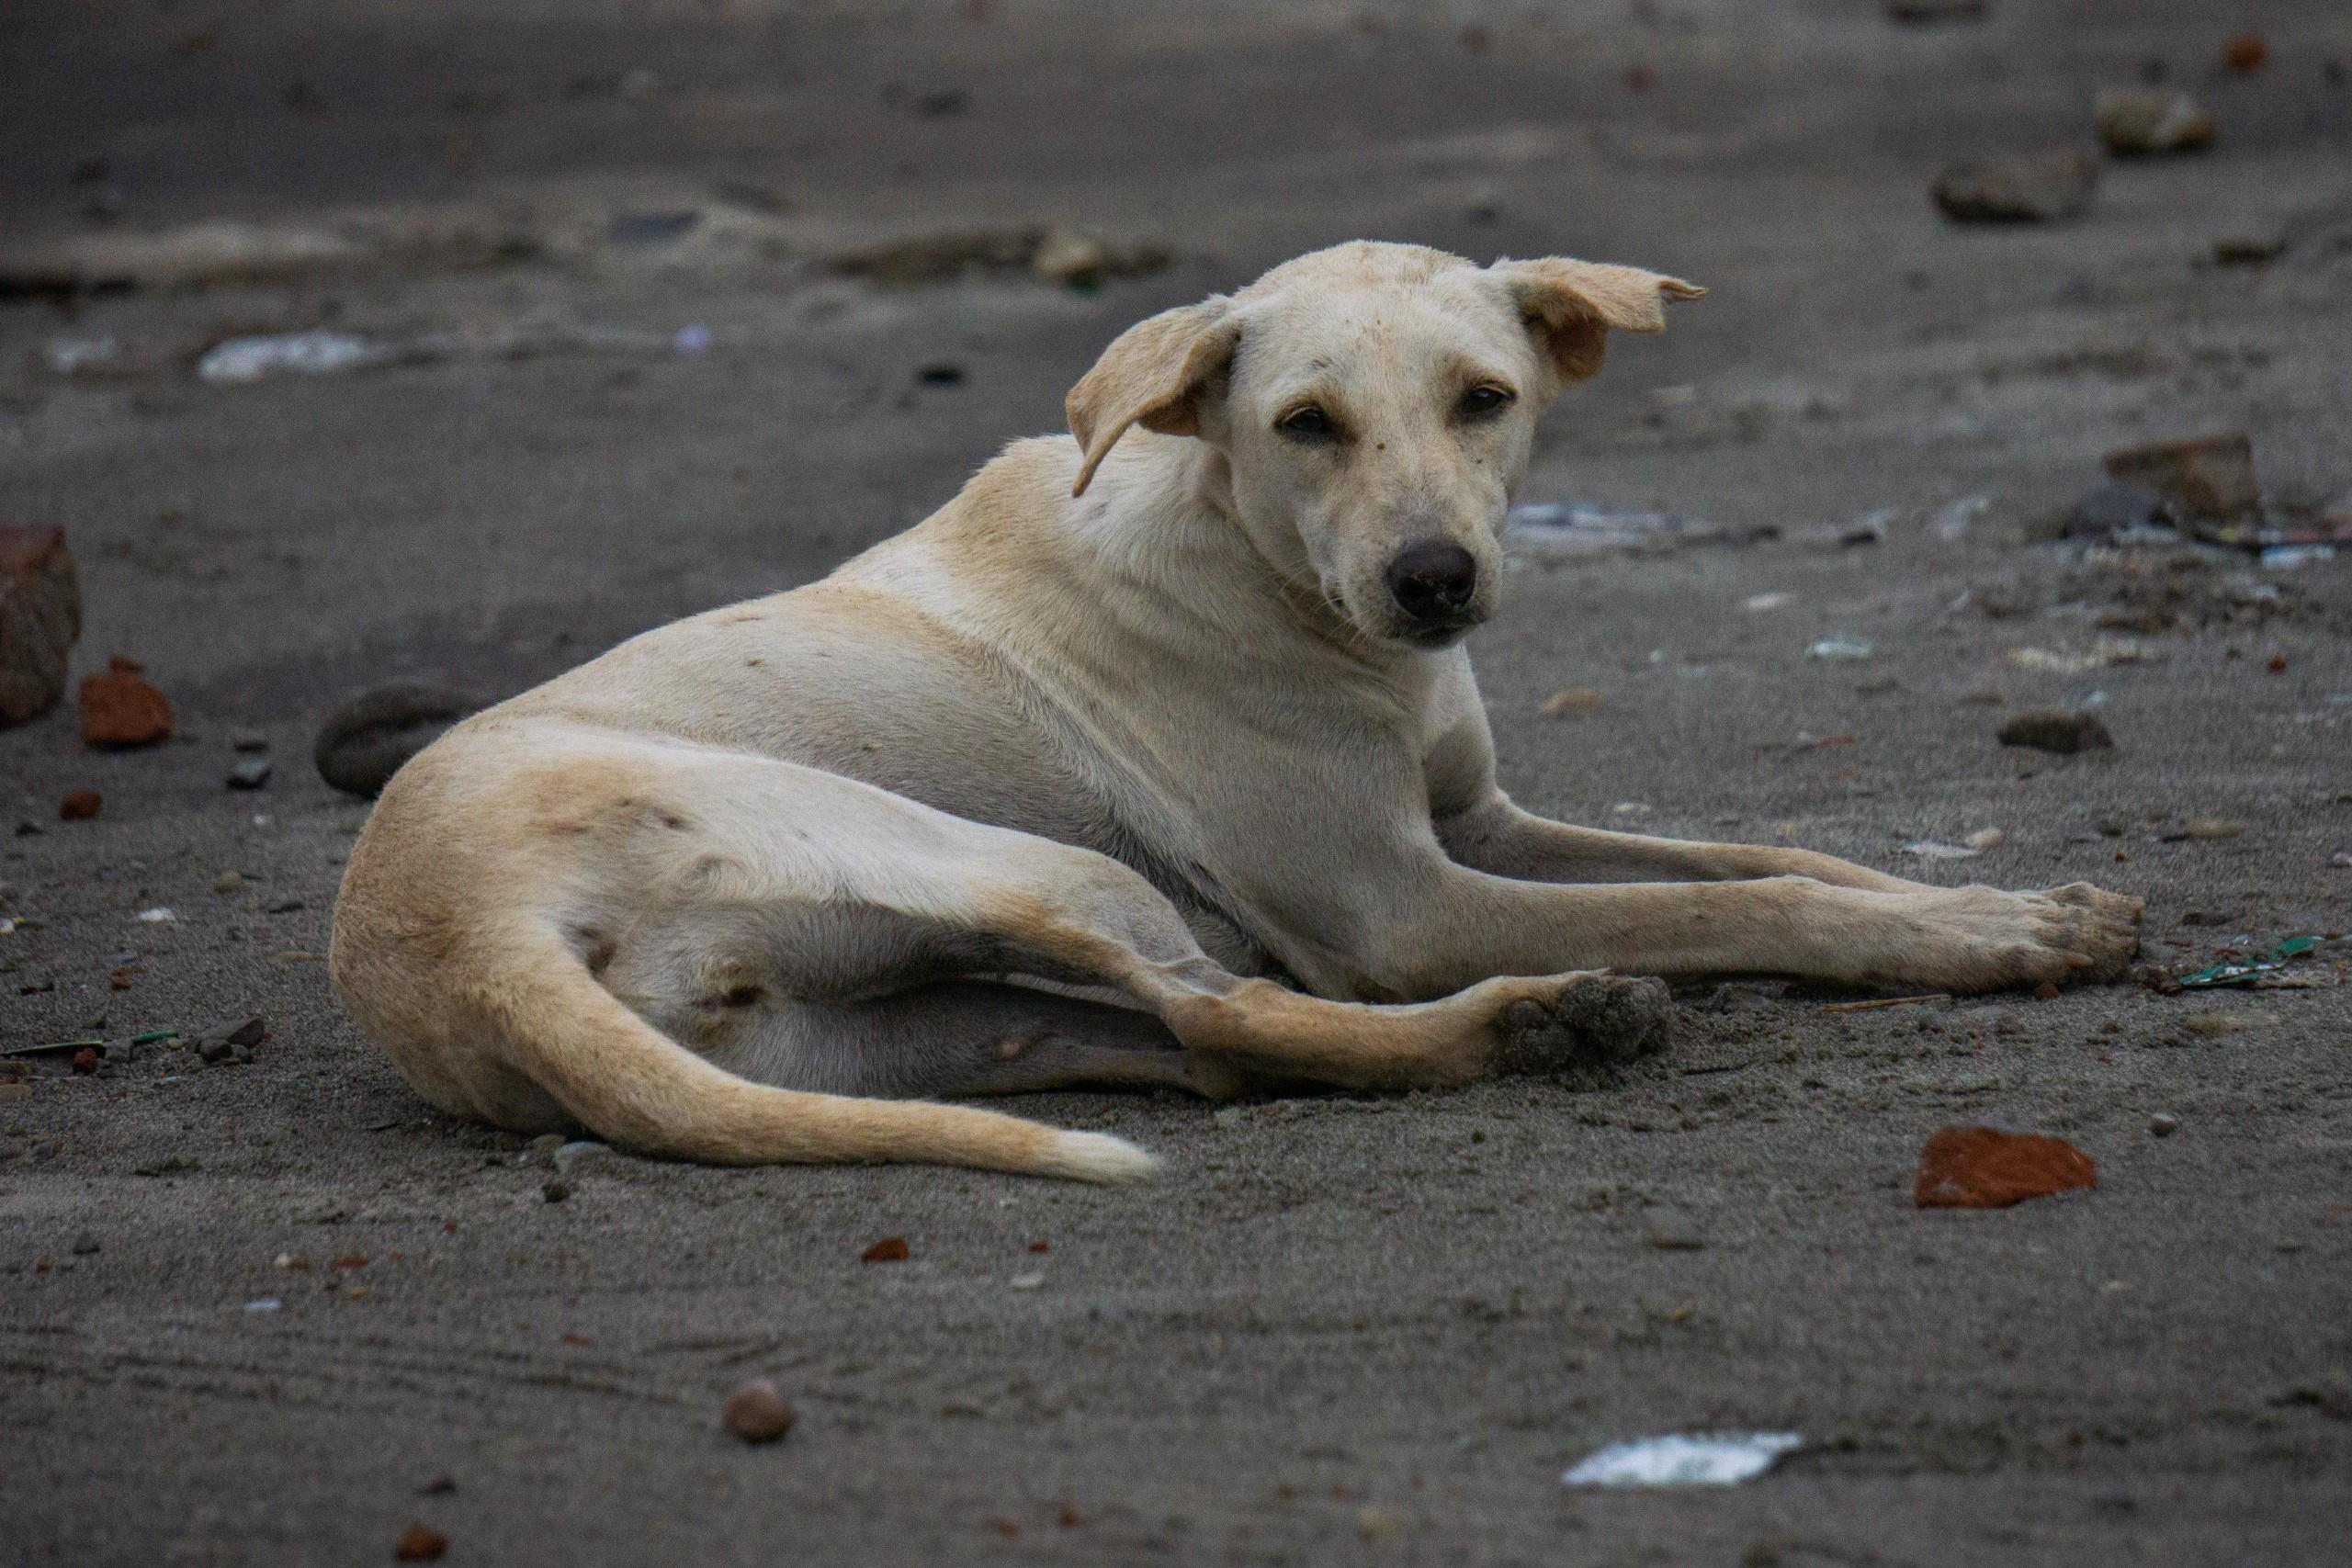 A Street Dog